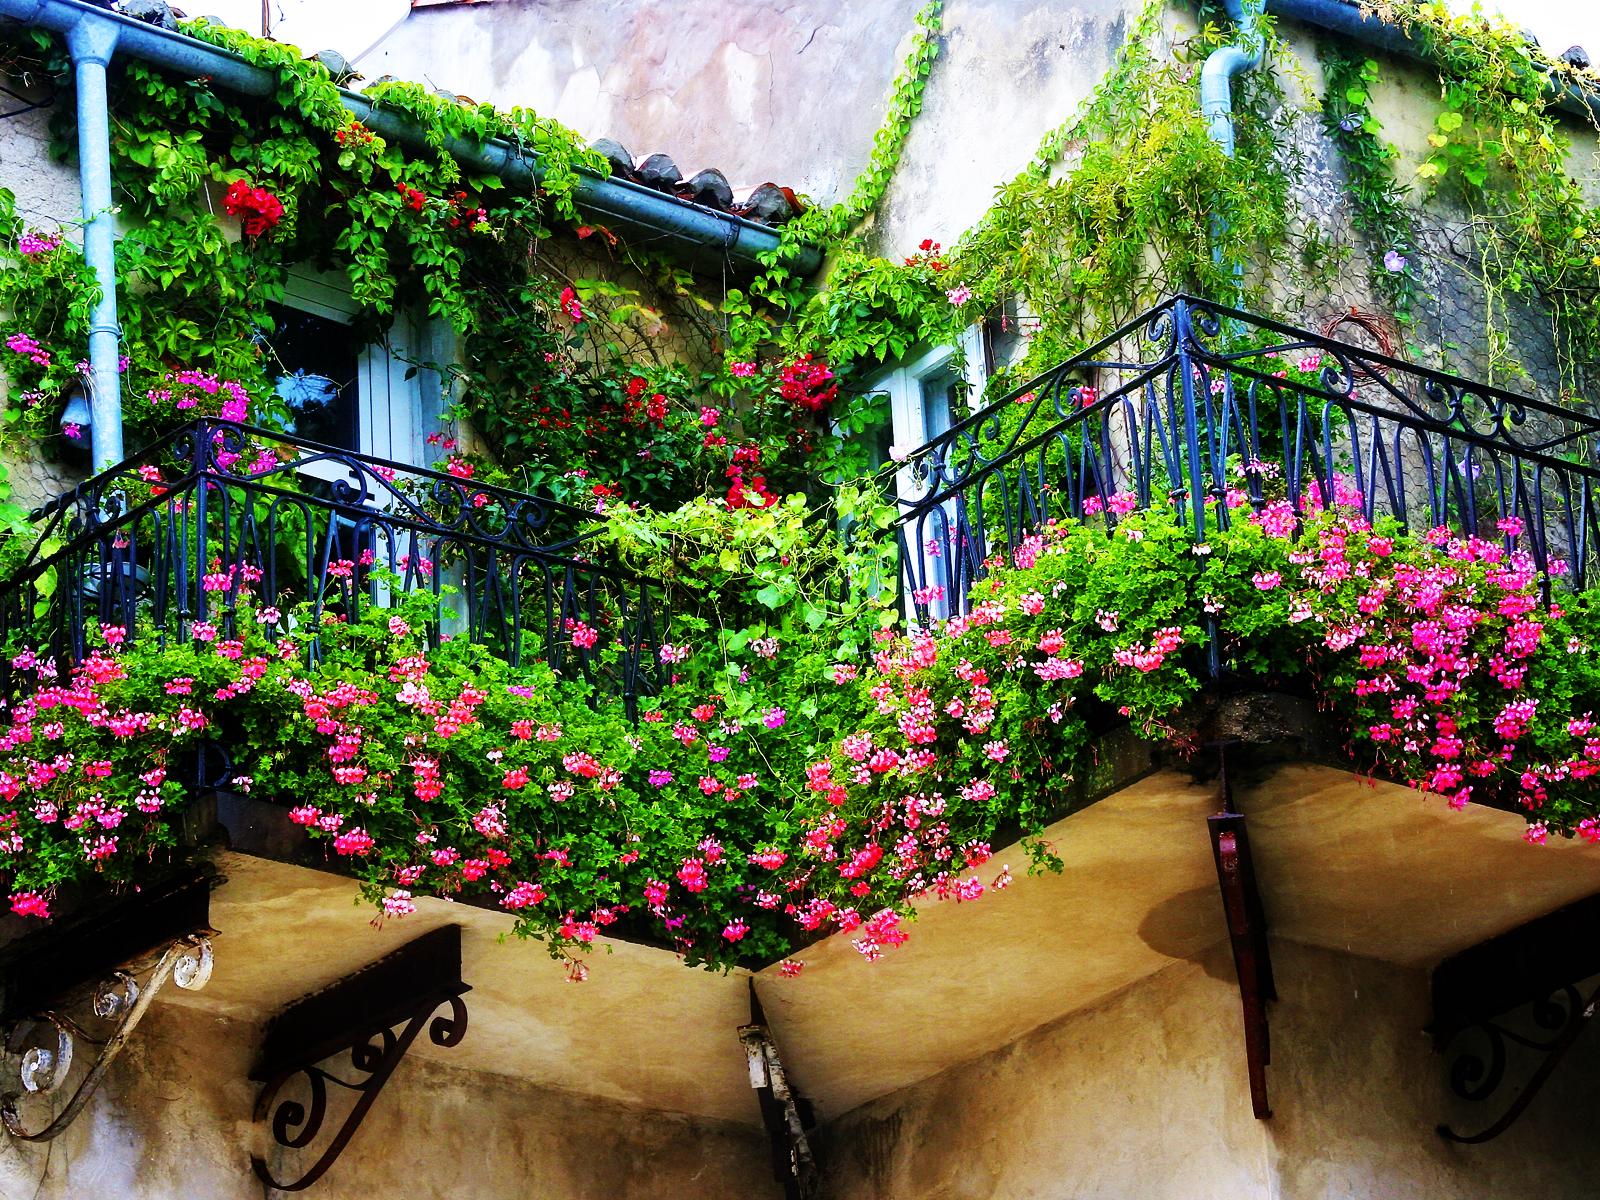 3 small balcony garden ideas plants.  Small Garden Ideas: Beautiful Renovations for Patio or Balcony